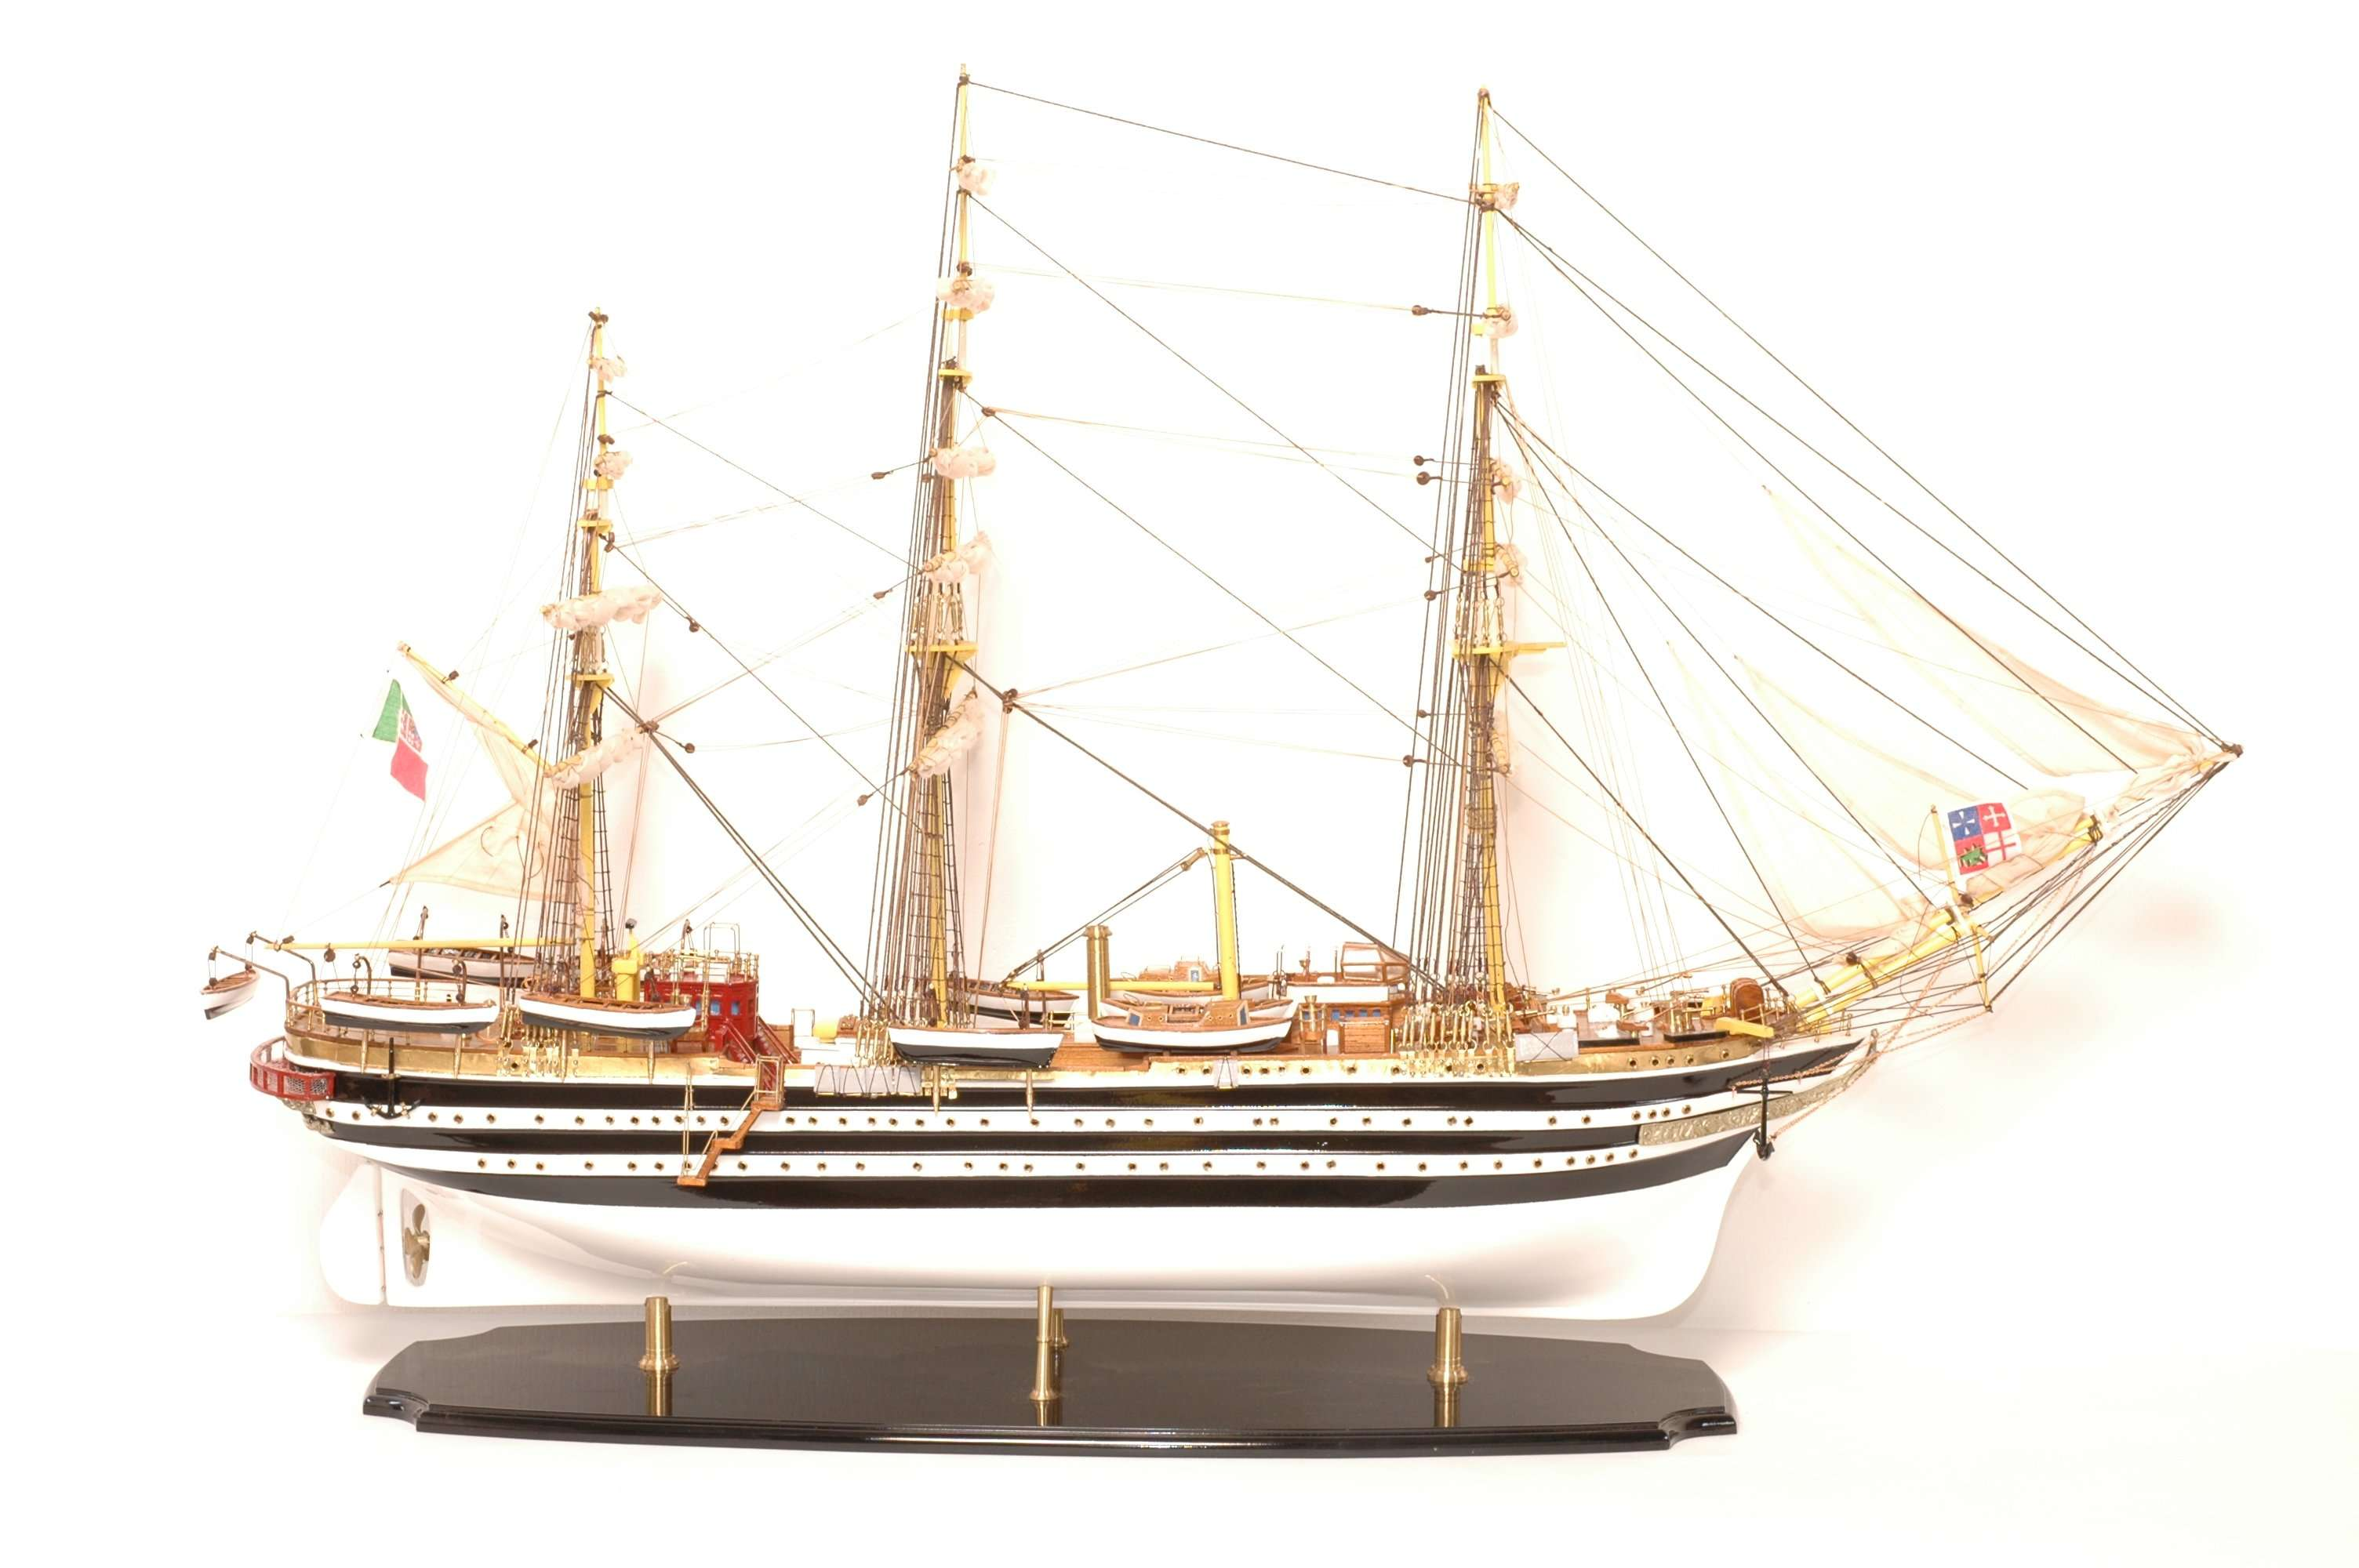 498-4210-Amerigo-Vespucci-Model-Ship-Superior-Range